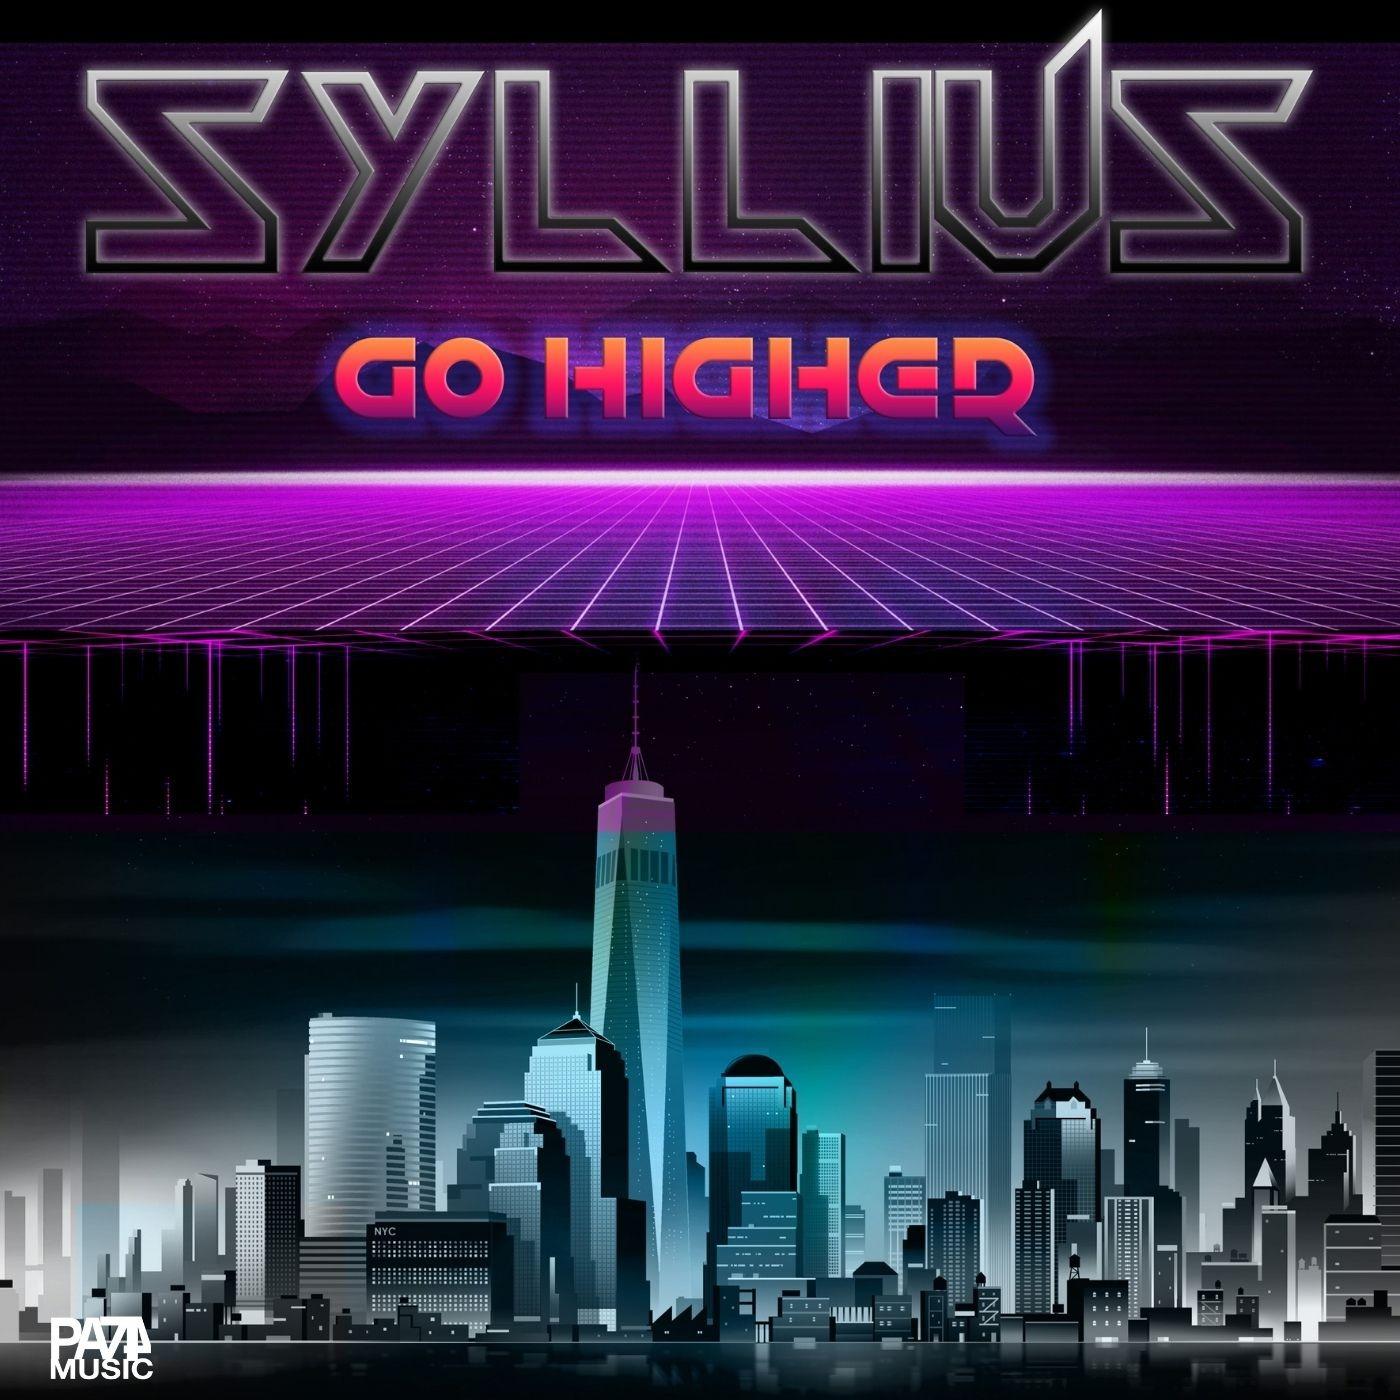 "S Y L L I U S ""Go Higher"" ©PA74 Music Publishing"